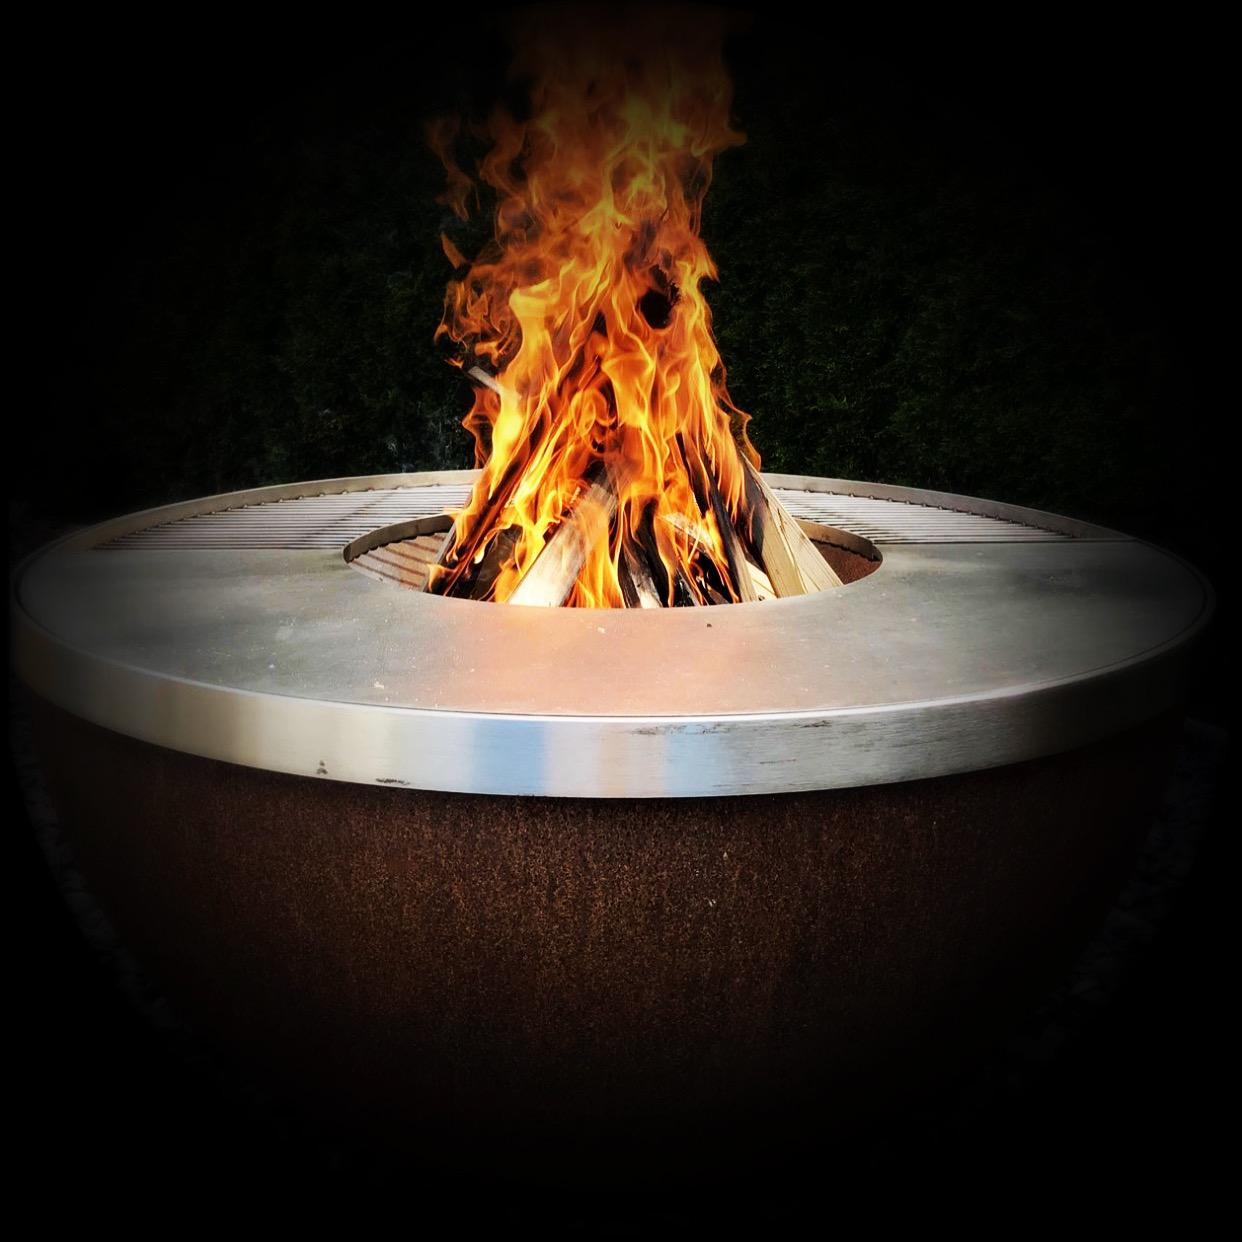 Freudengarten feuerkugel noun von stahl art rufer - Feuerkugel garten ...